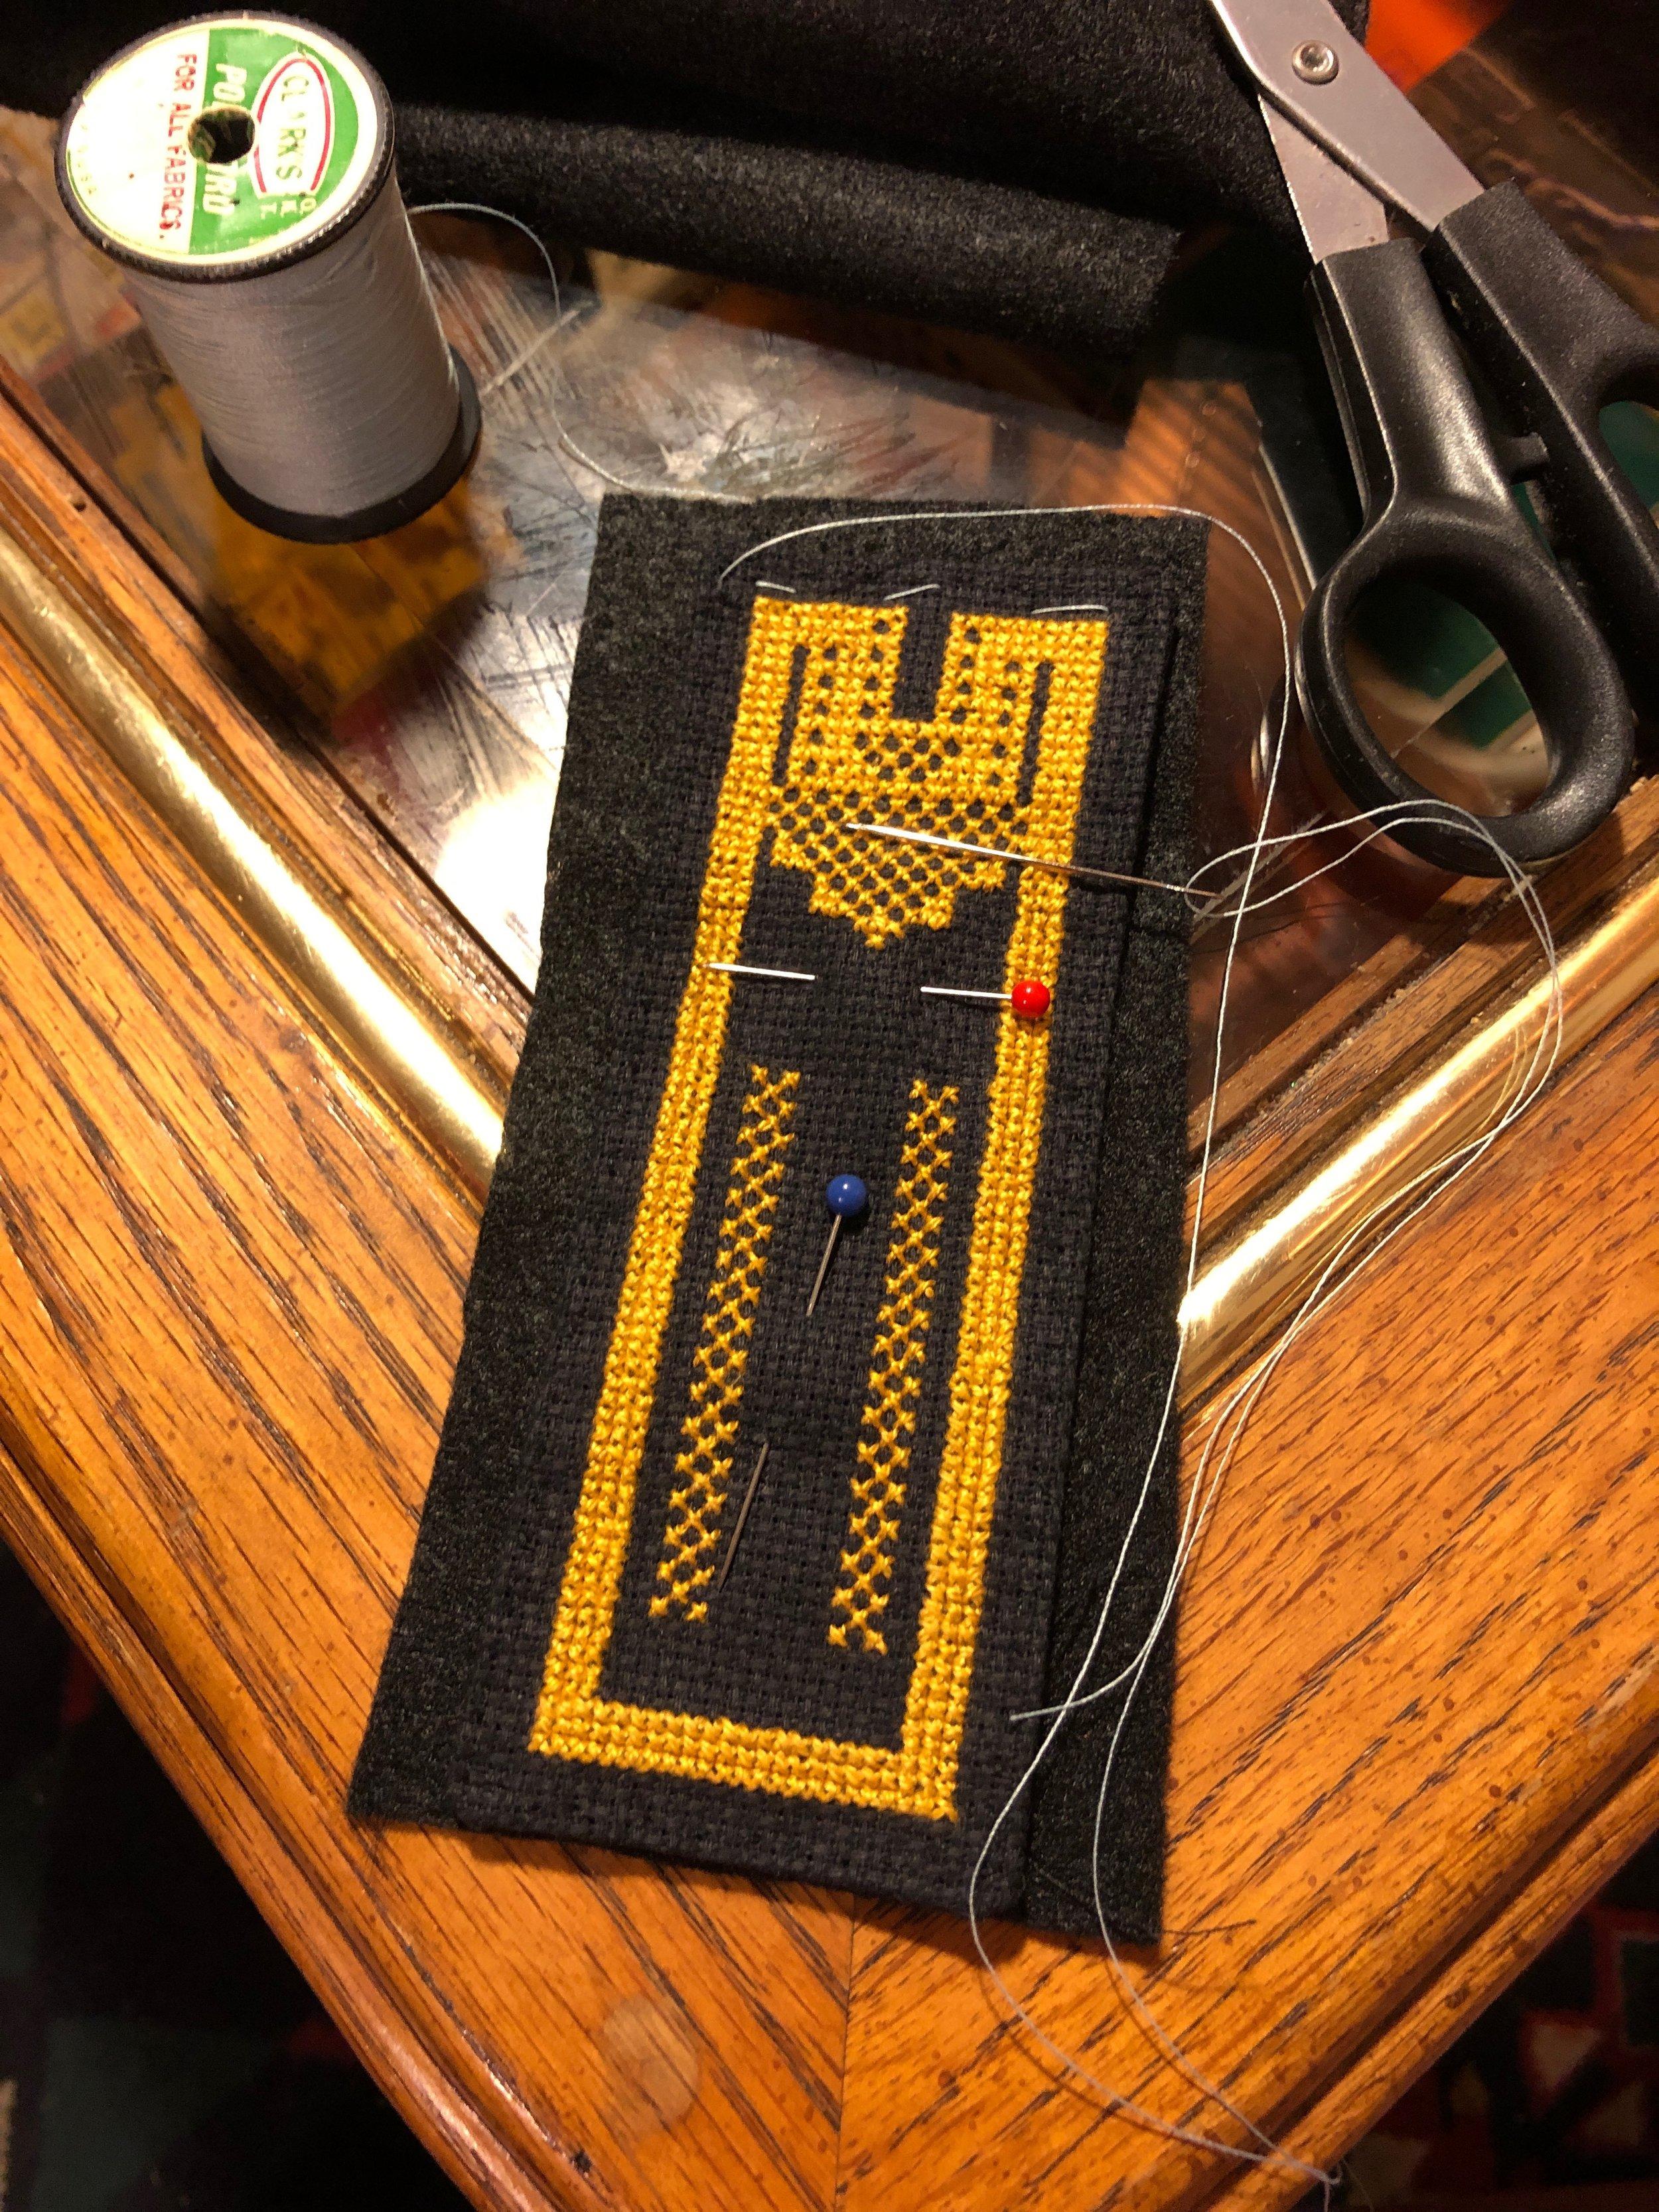 """Basting"" the uncut felt onto the Black aida cloth with white thread"